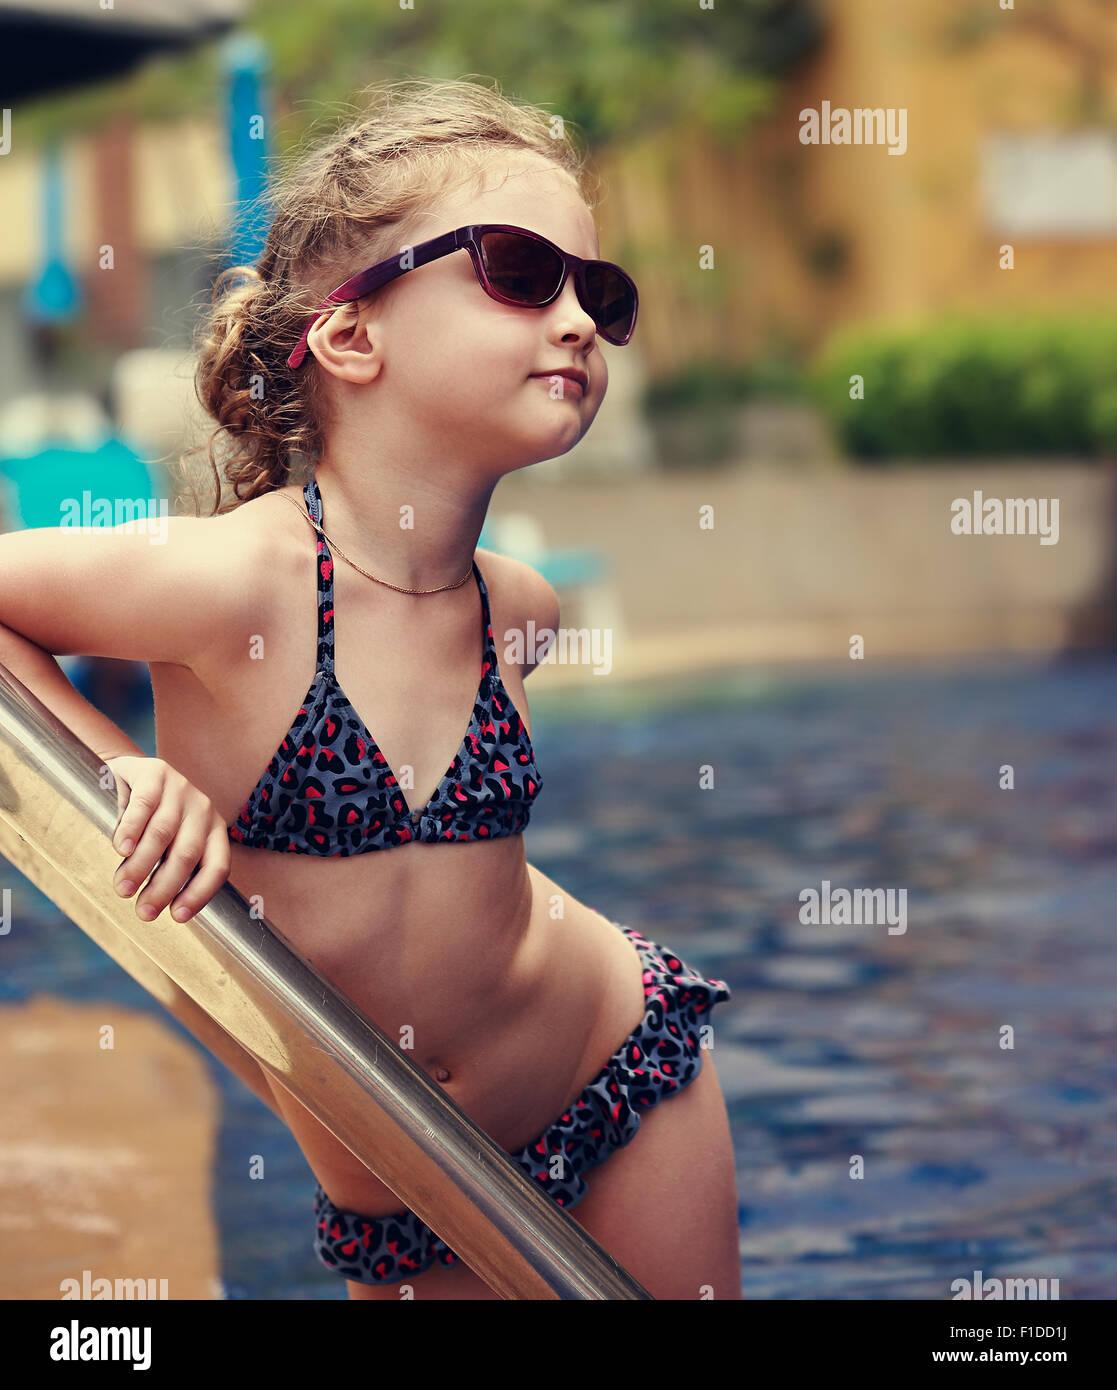 Posing Bikini Images - Photos - Pictures - CrystalGraphics